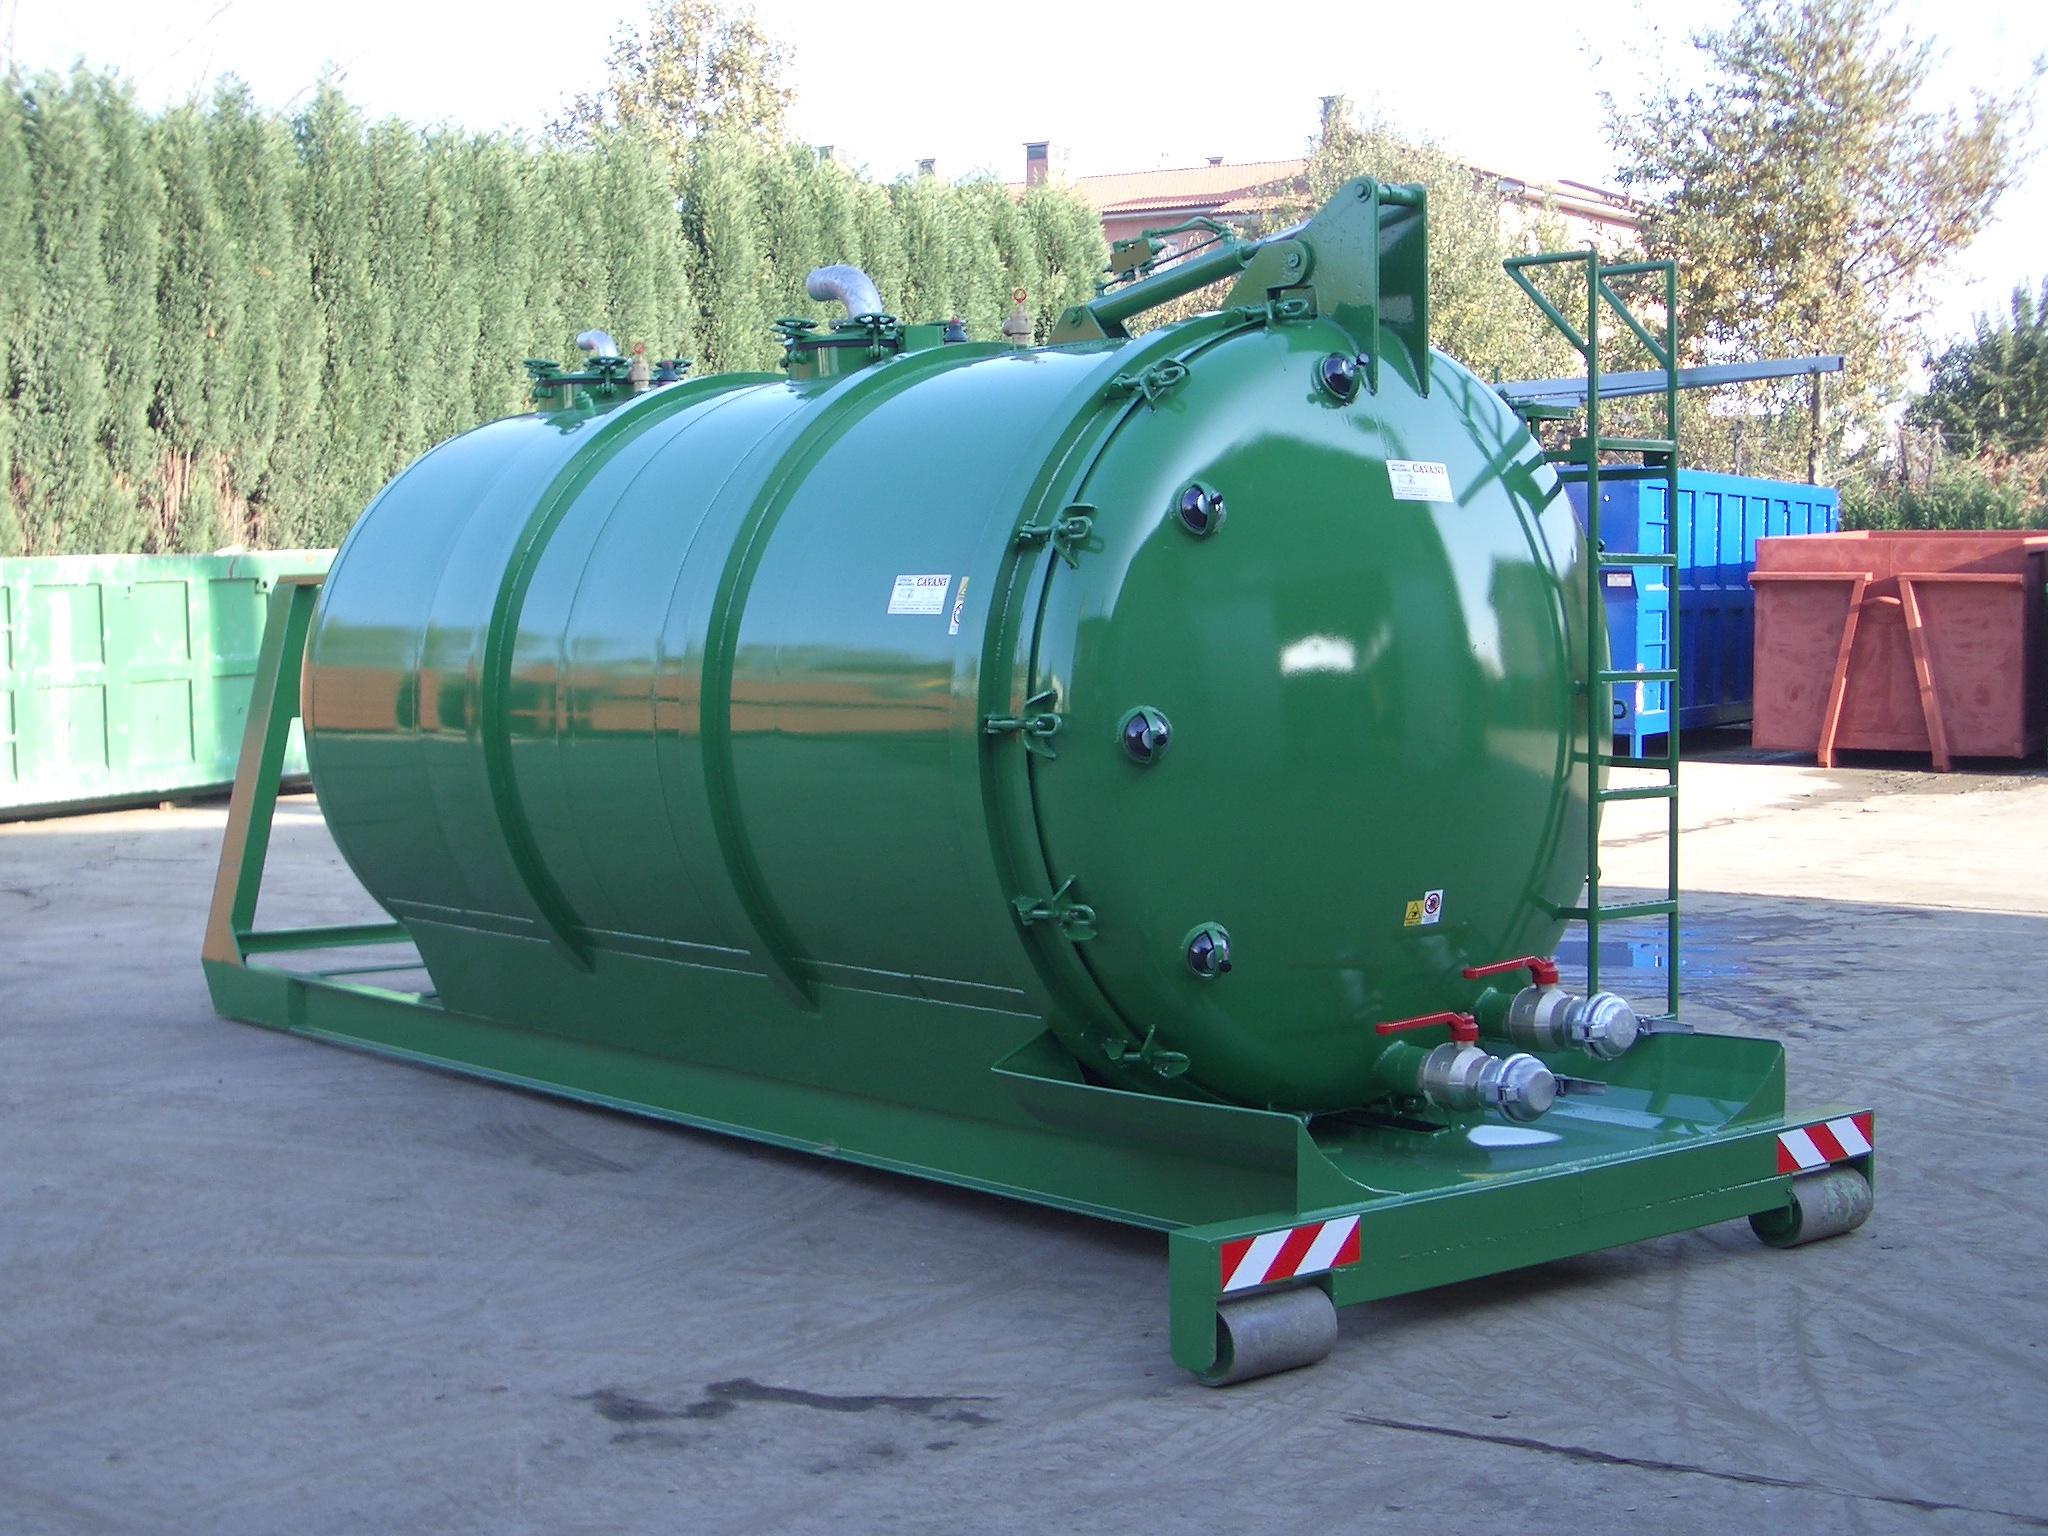 Cisterna Scarrabile